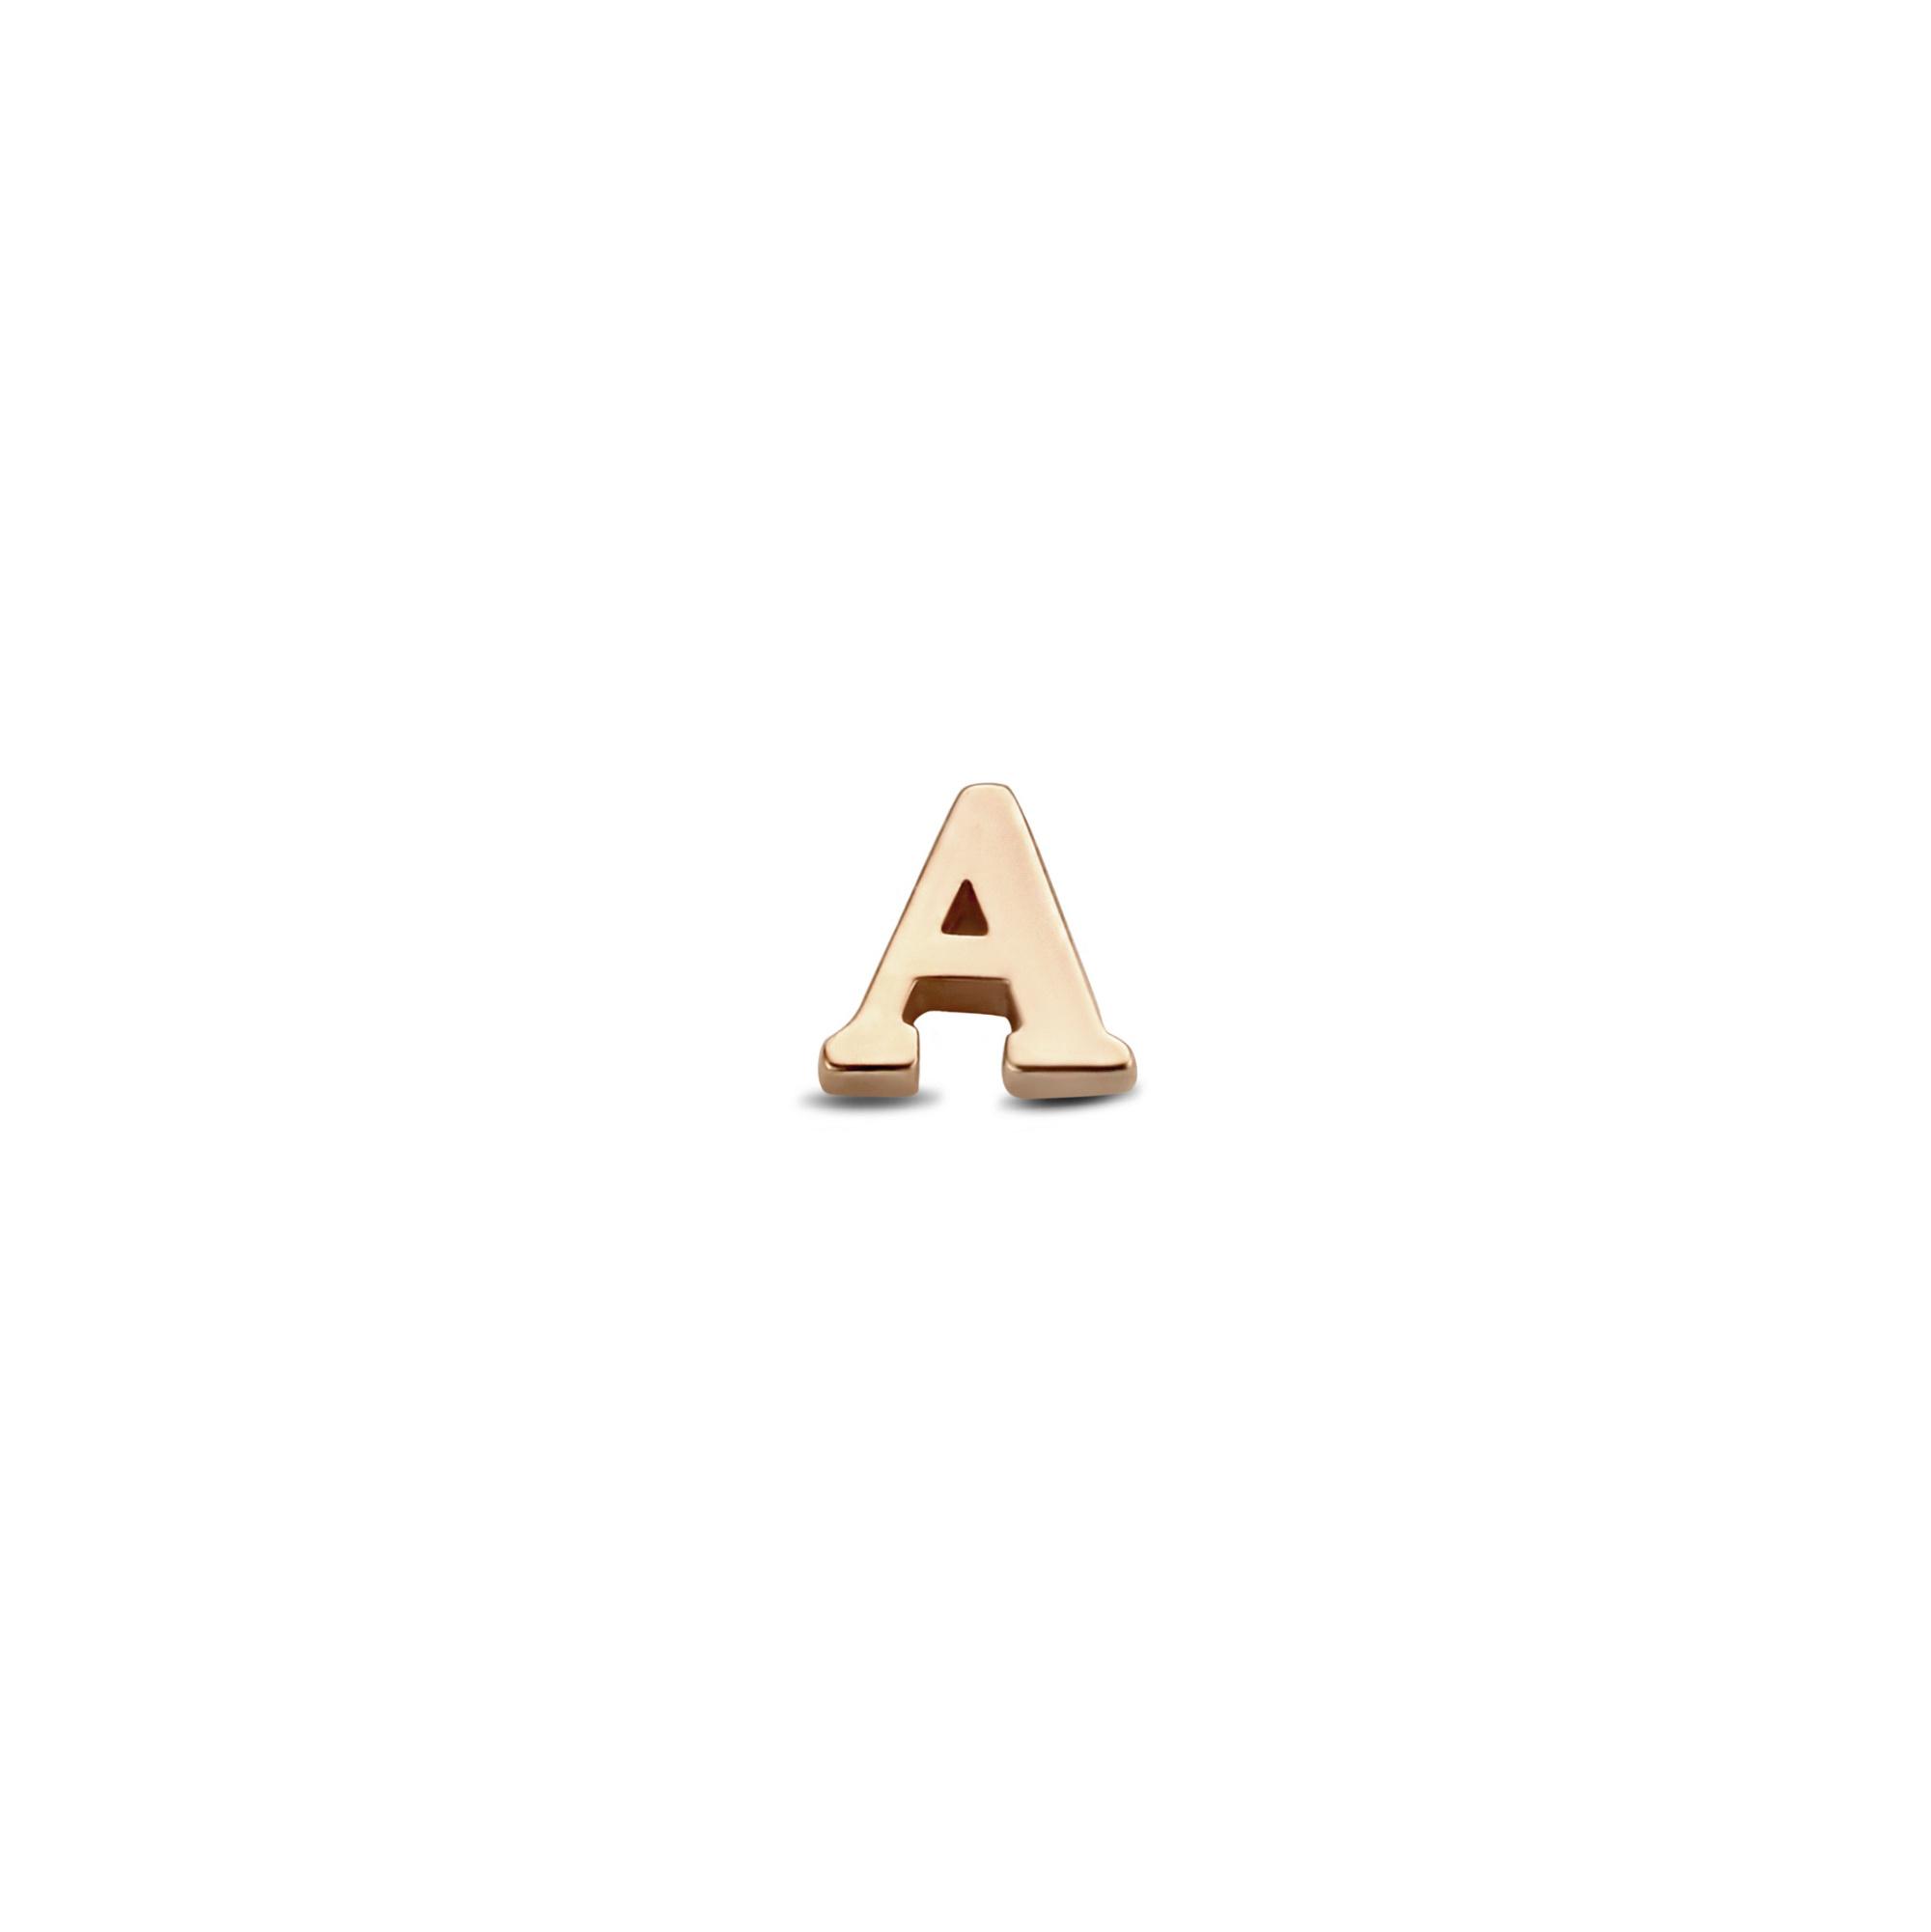 Isabel Bernard La Concorde Guillaine 14 karaat rosé gouden initial enkele oorknop met letter